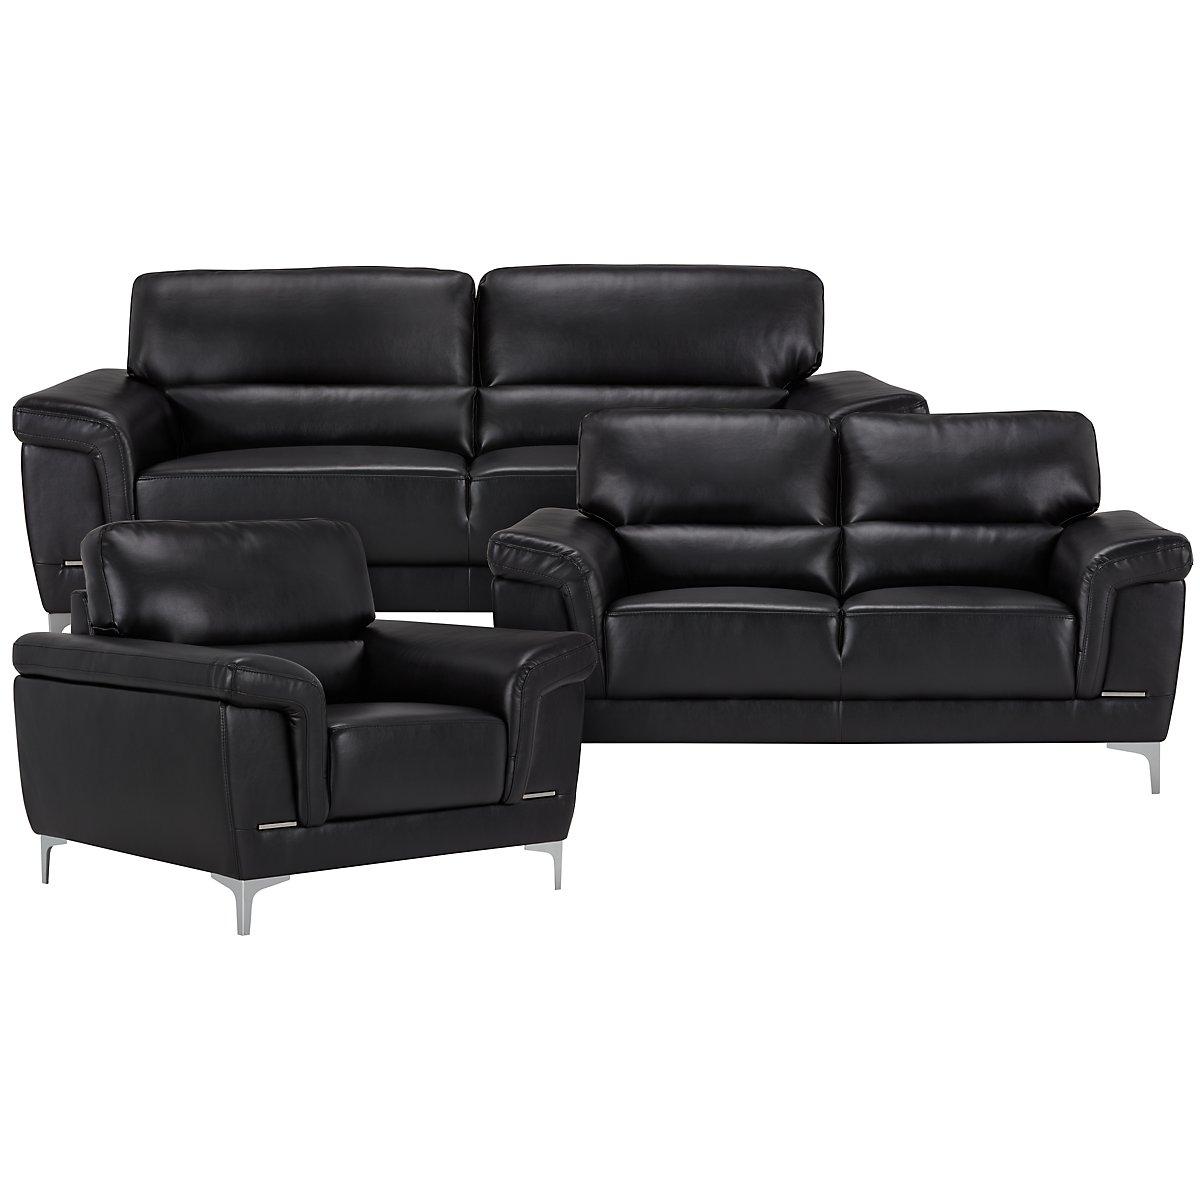 City Furniture Enzo Black Microfiber Loveseat